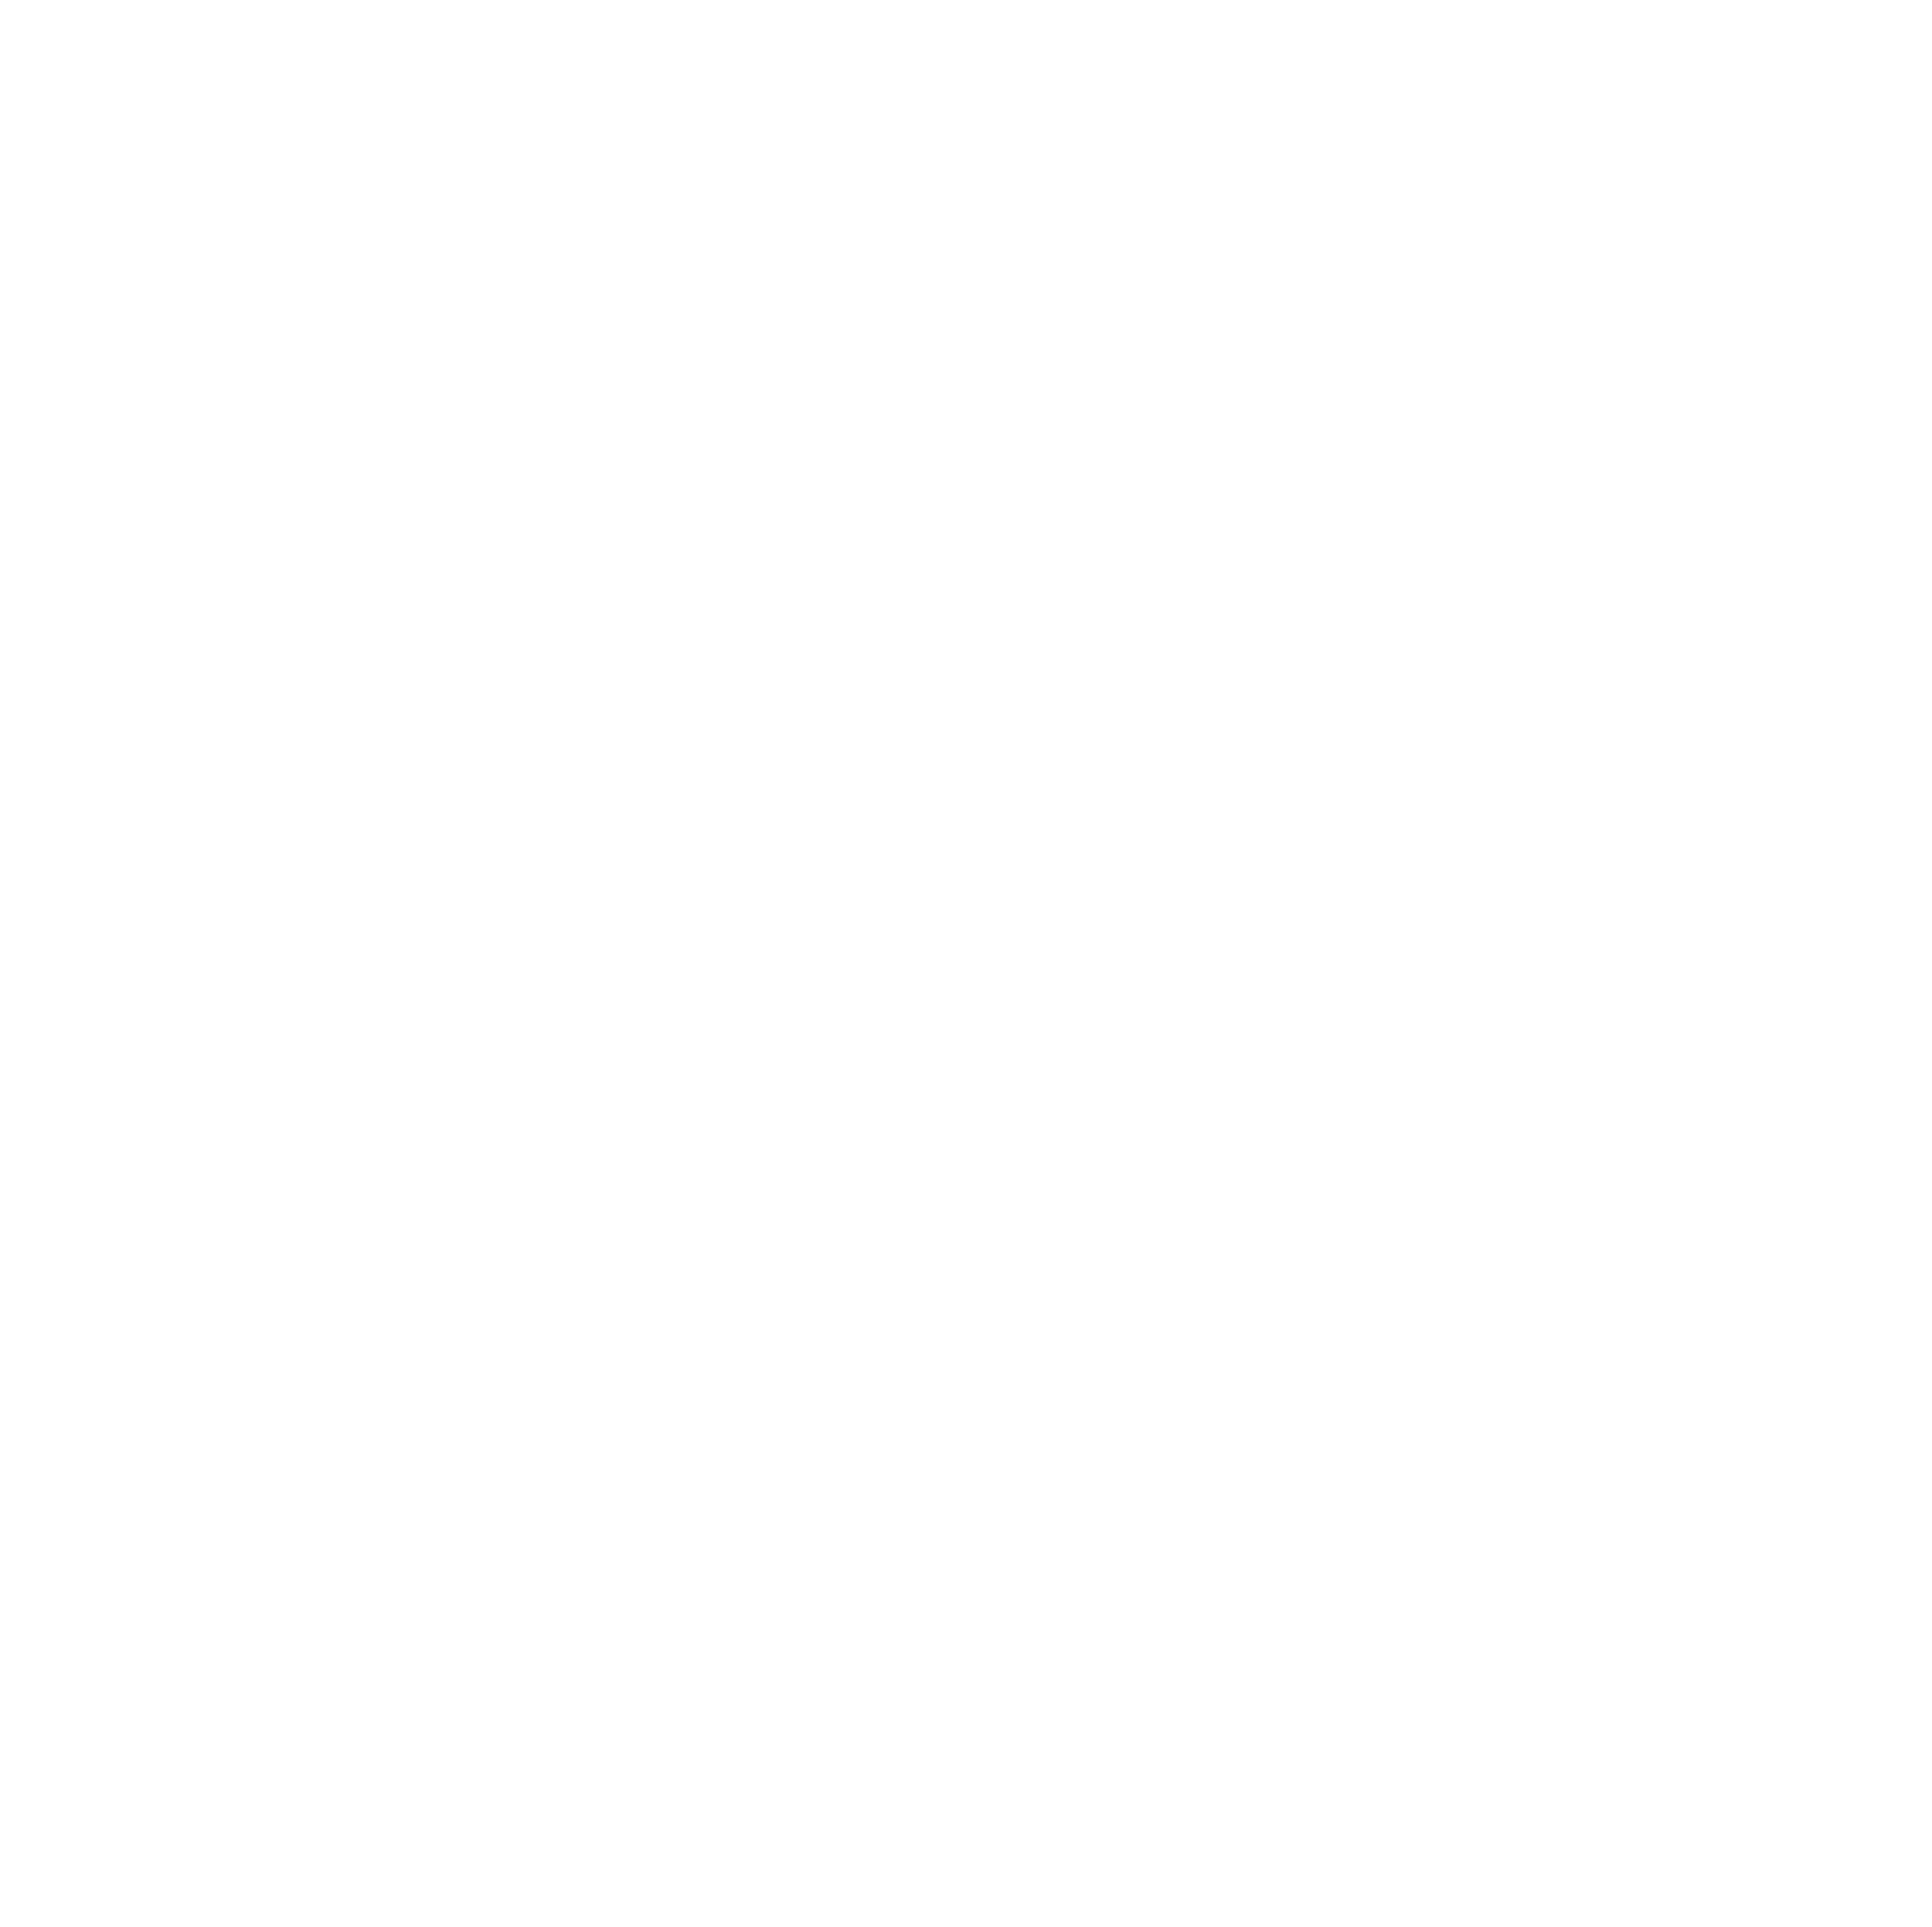 Bandcamp icon